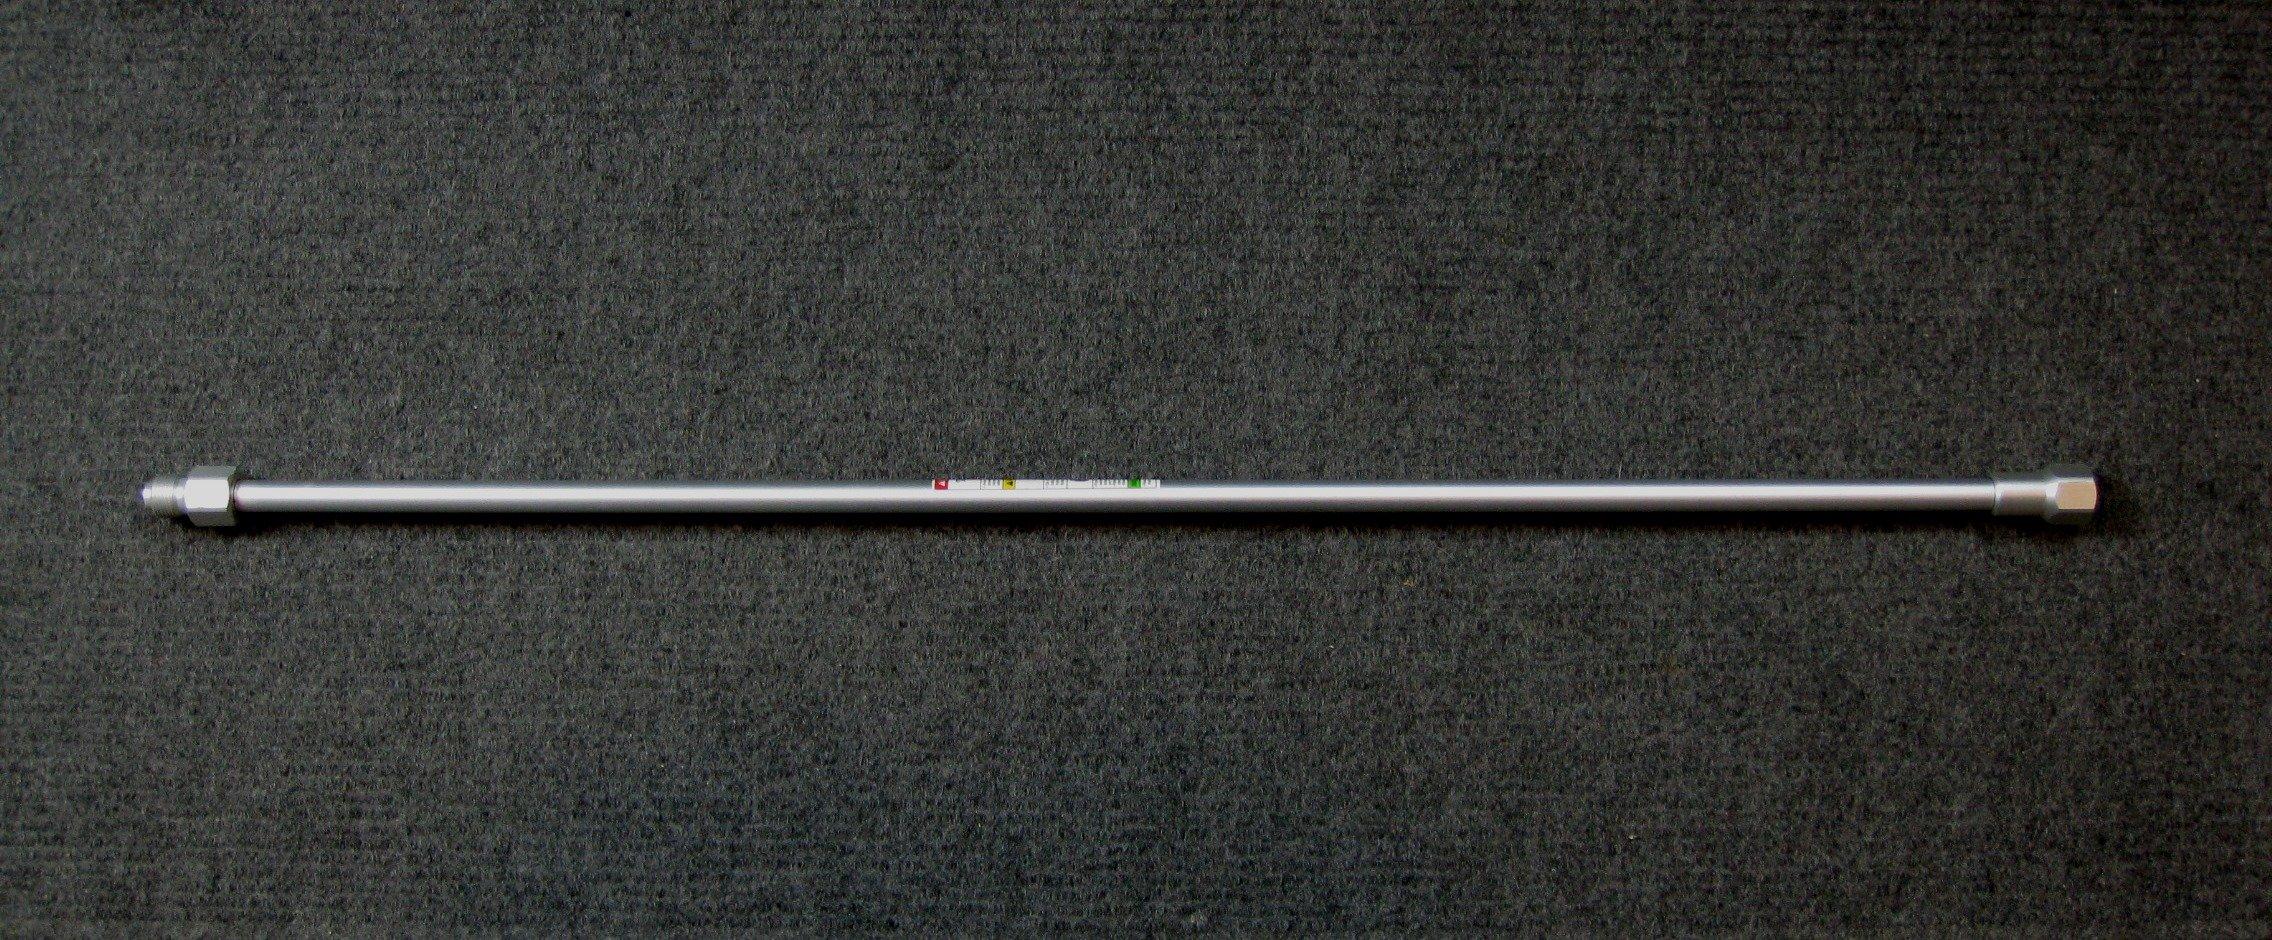 3' Tip Extension - Airless Gun Extension Titan OEM 310-383-1